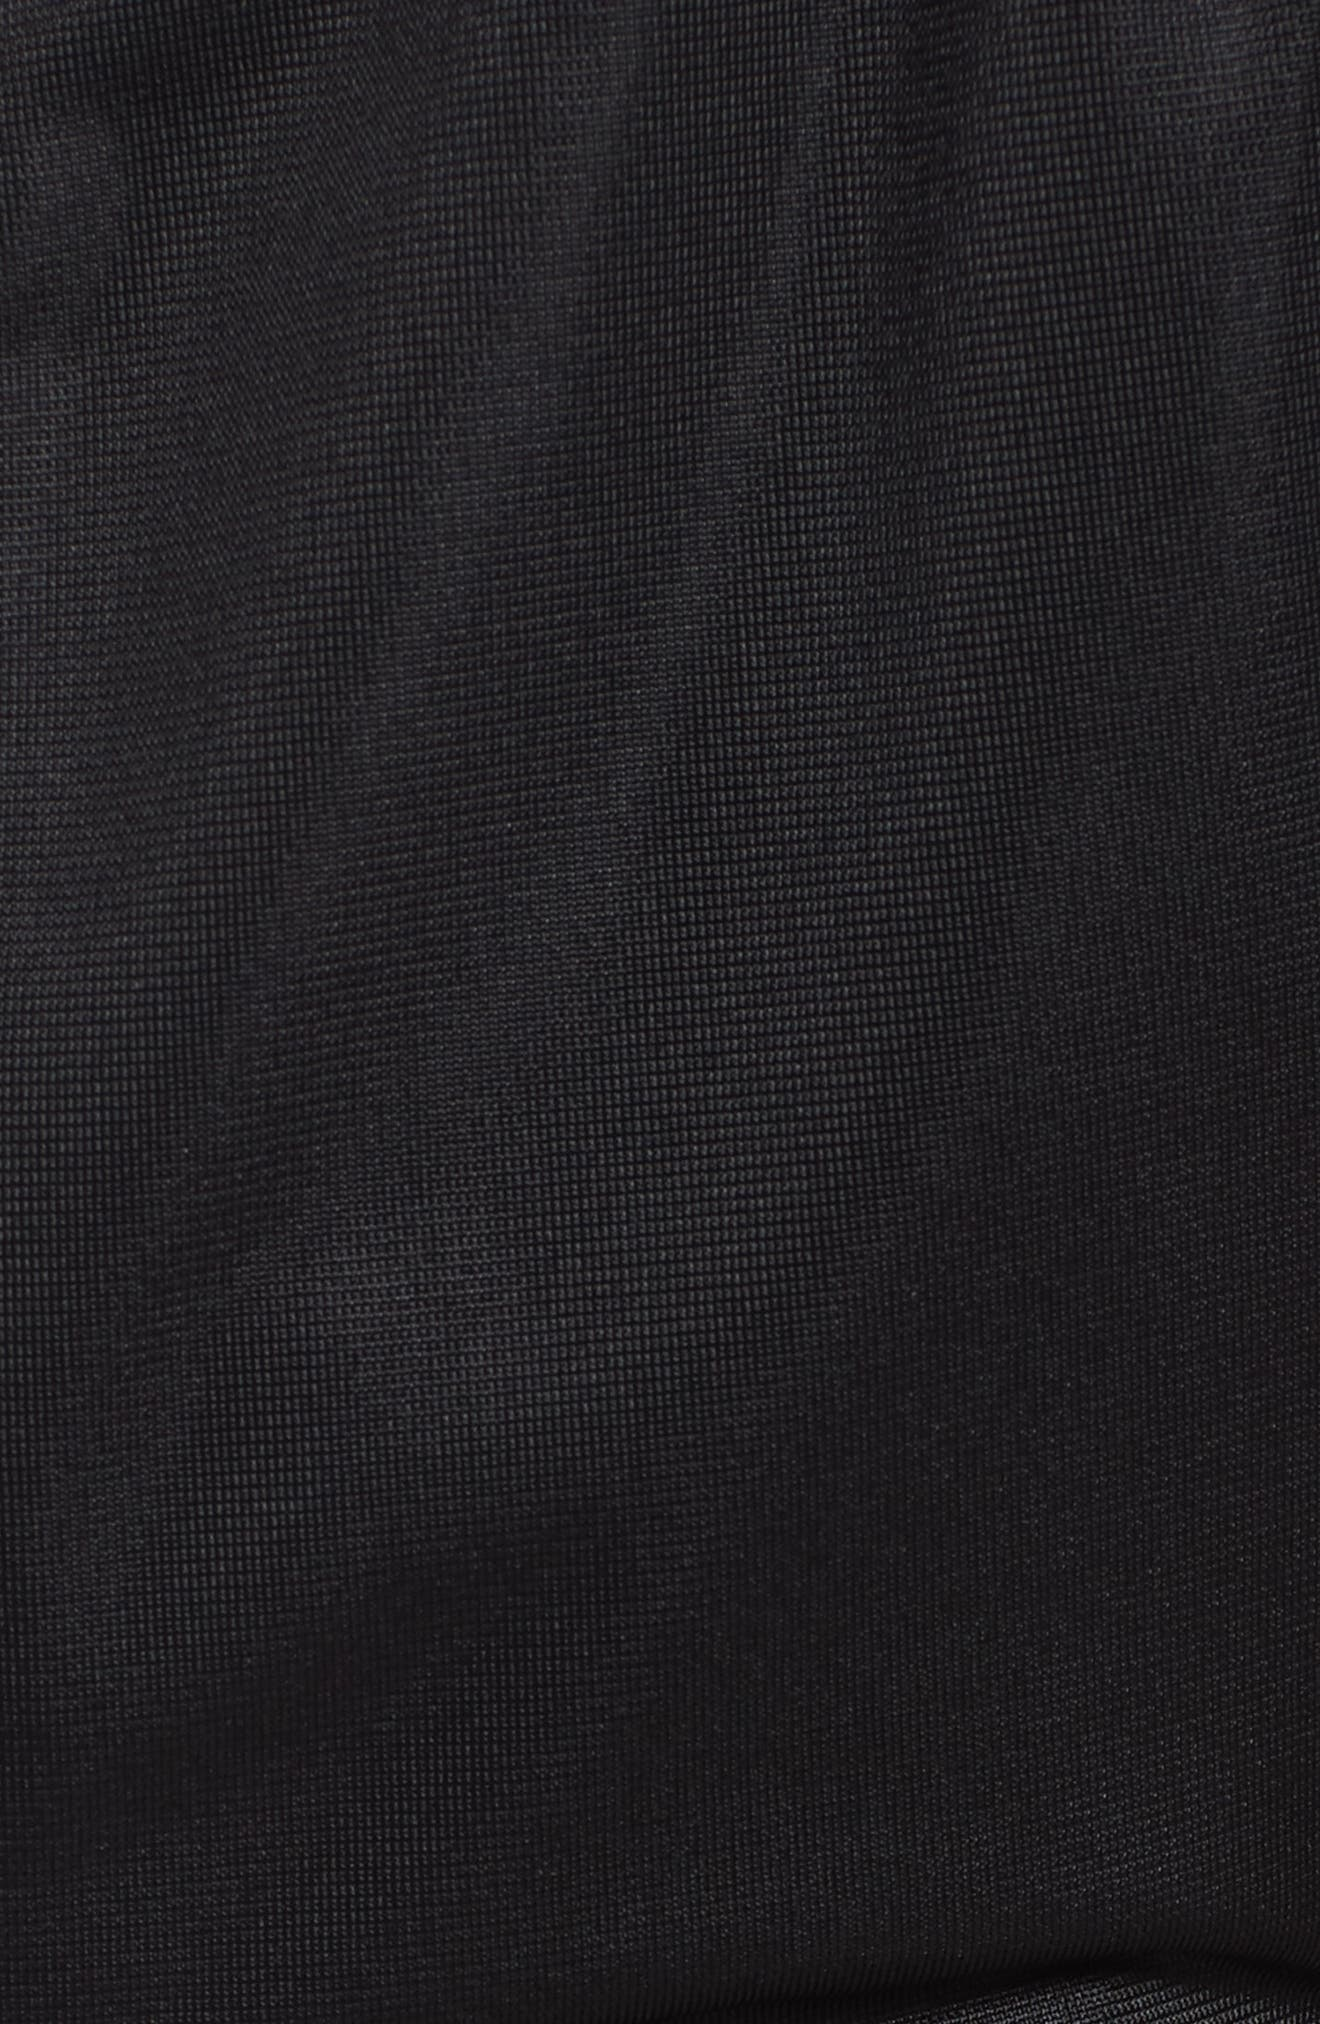 222 Banda 10 Arsis Pants,                             Alternate thumbnail 6, color,                             Black-White